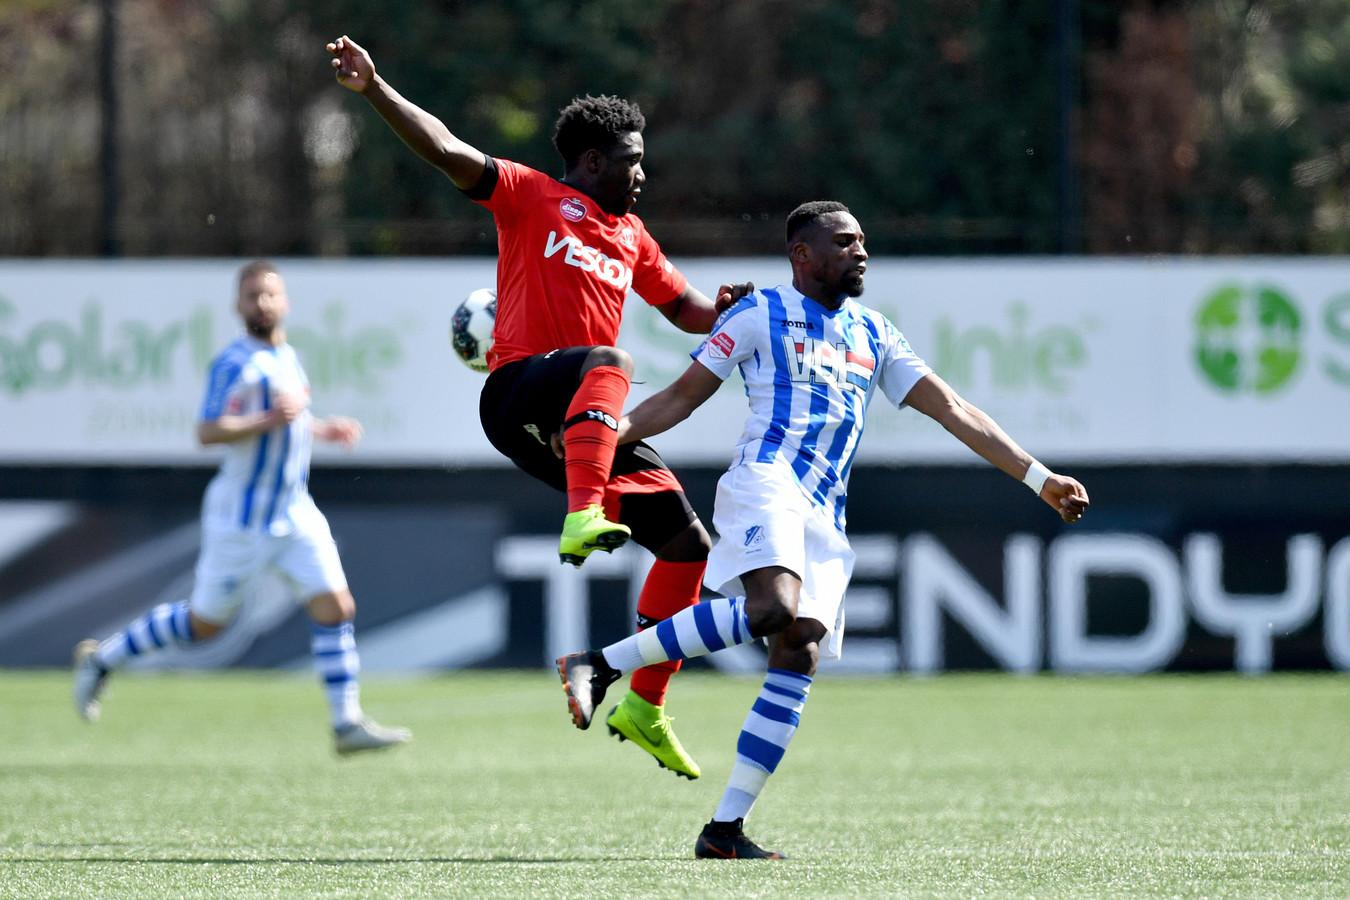 Maiky Fecunda (links) namens Helmond Sport in duel met Elton Kabangu van FC Eindhoven.